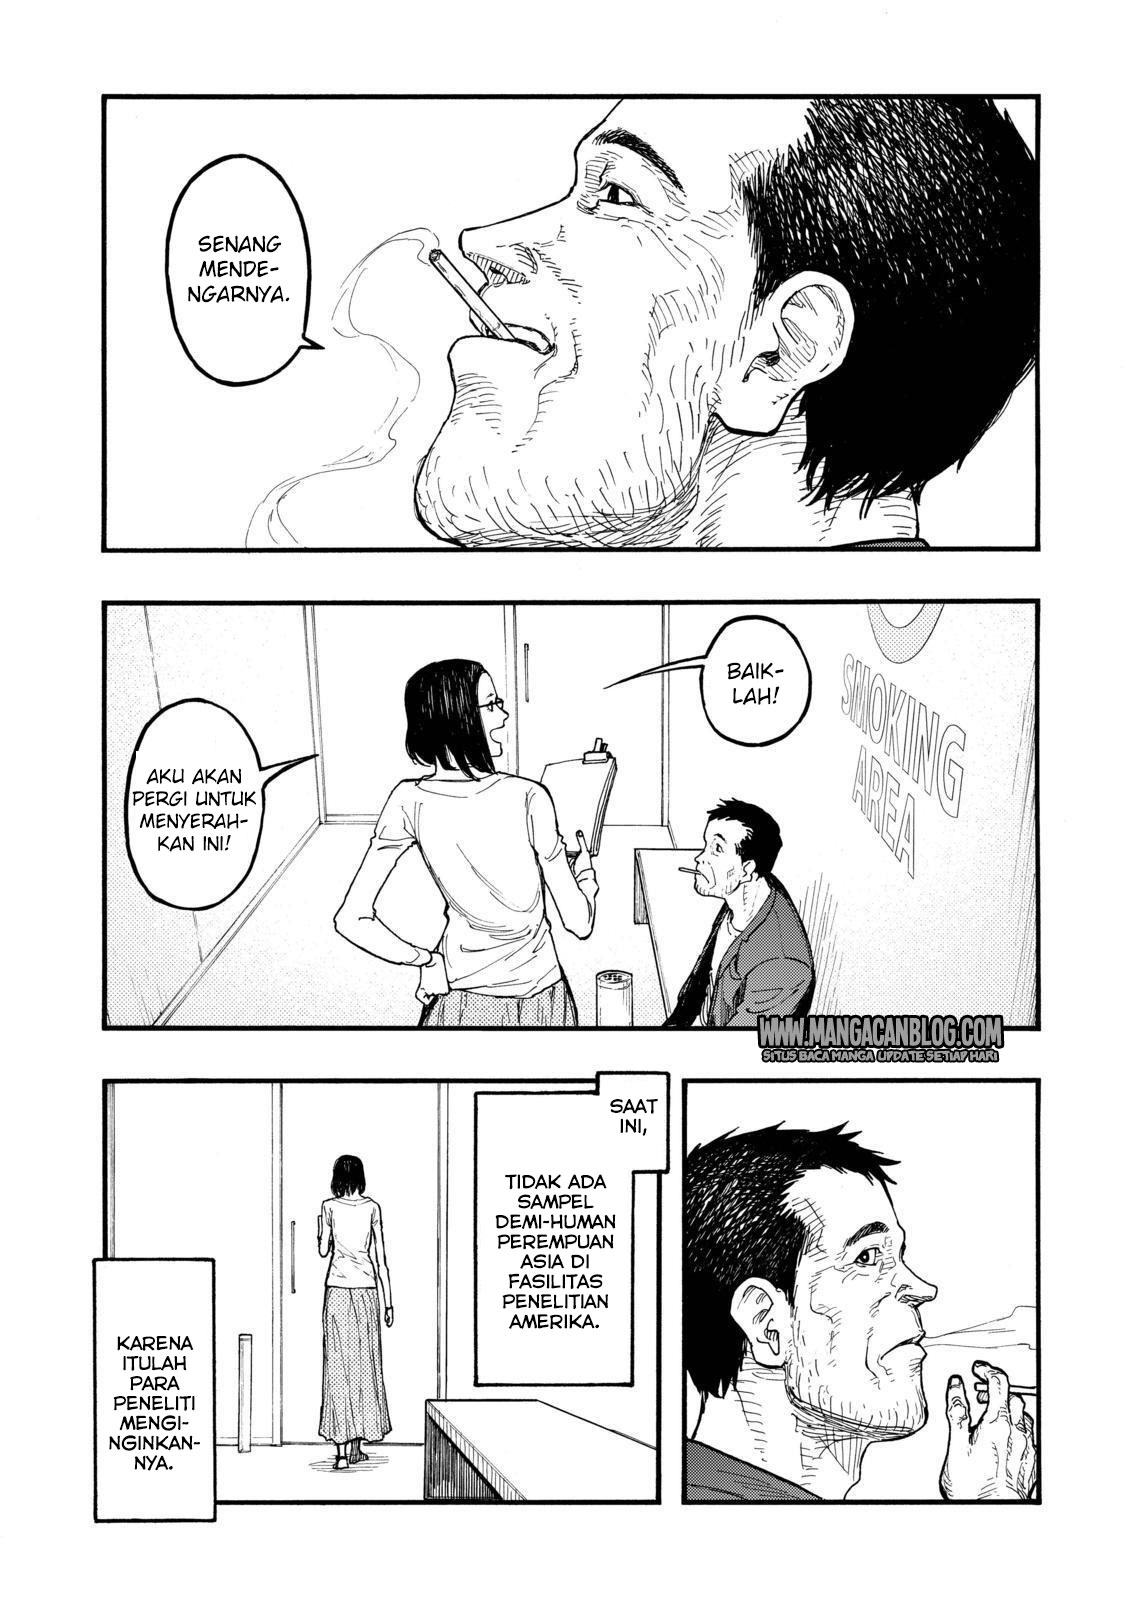 Dilarang COPAS - situs resmi www.mangacanblog.com - Komik ajin 046 - selamat pagi, sampai jumpa besok 47 Indonesia ajin 046 - selamat pagi, sampai jumpa besok Terbaru 35|Baca Manga Komik Indonesia|Mangacan